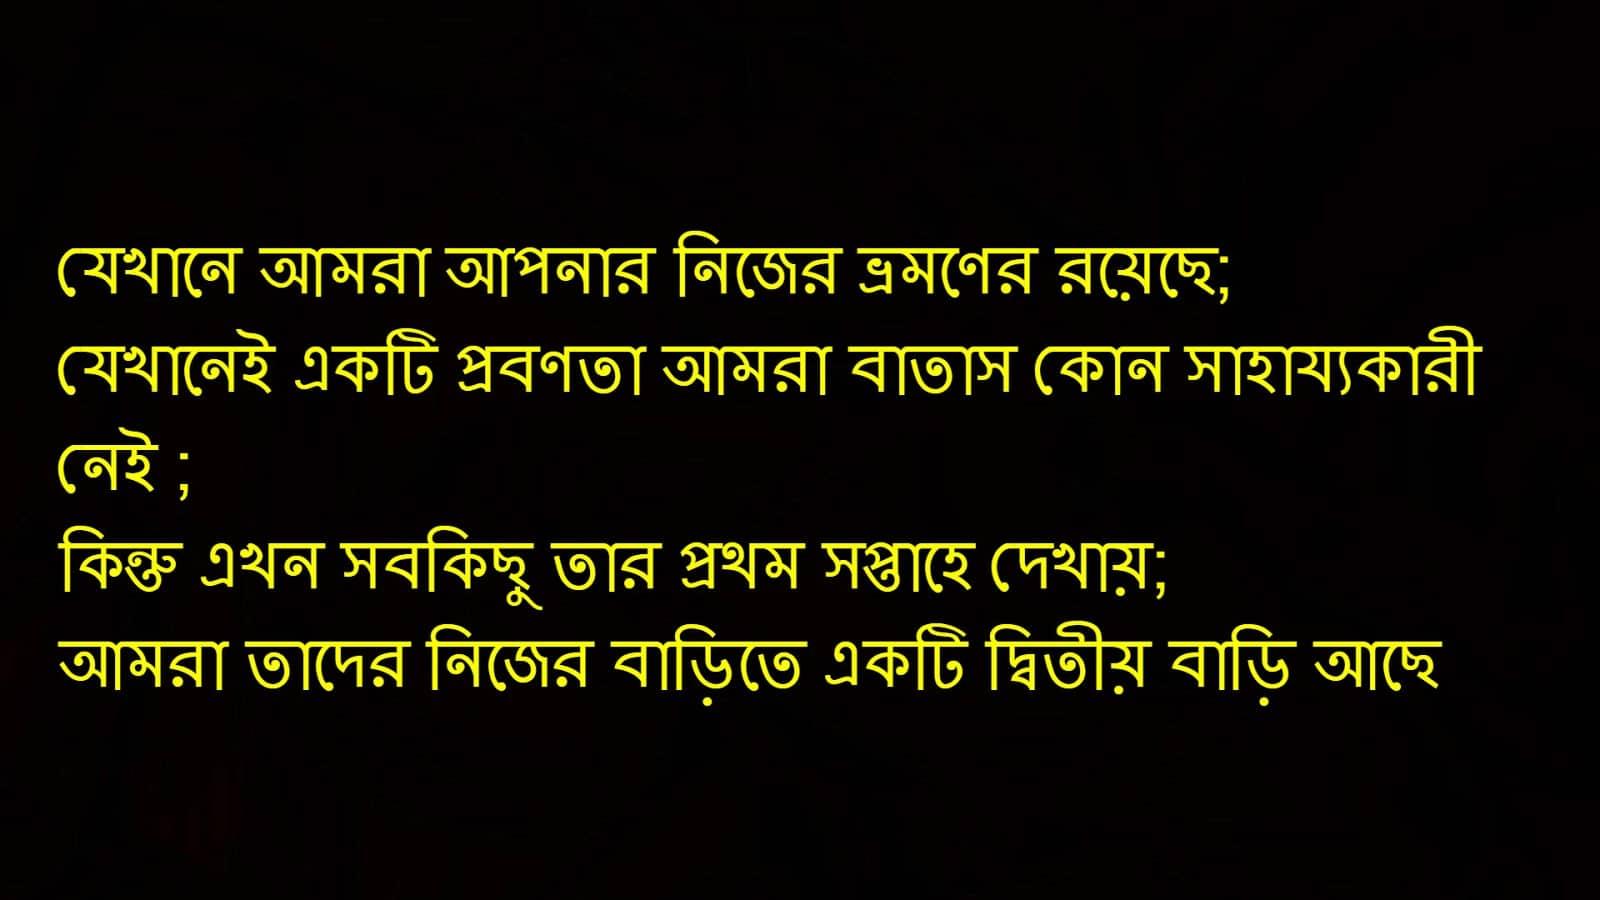 Bengali Font Picture